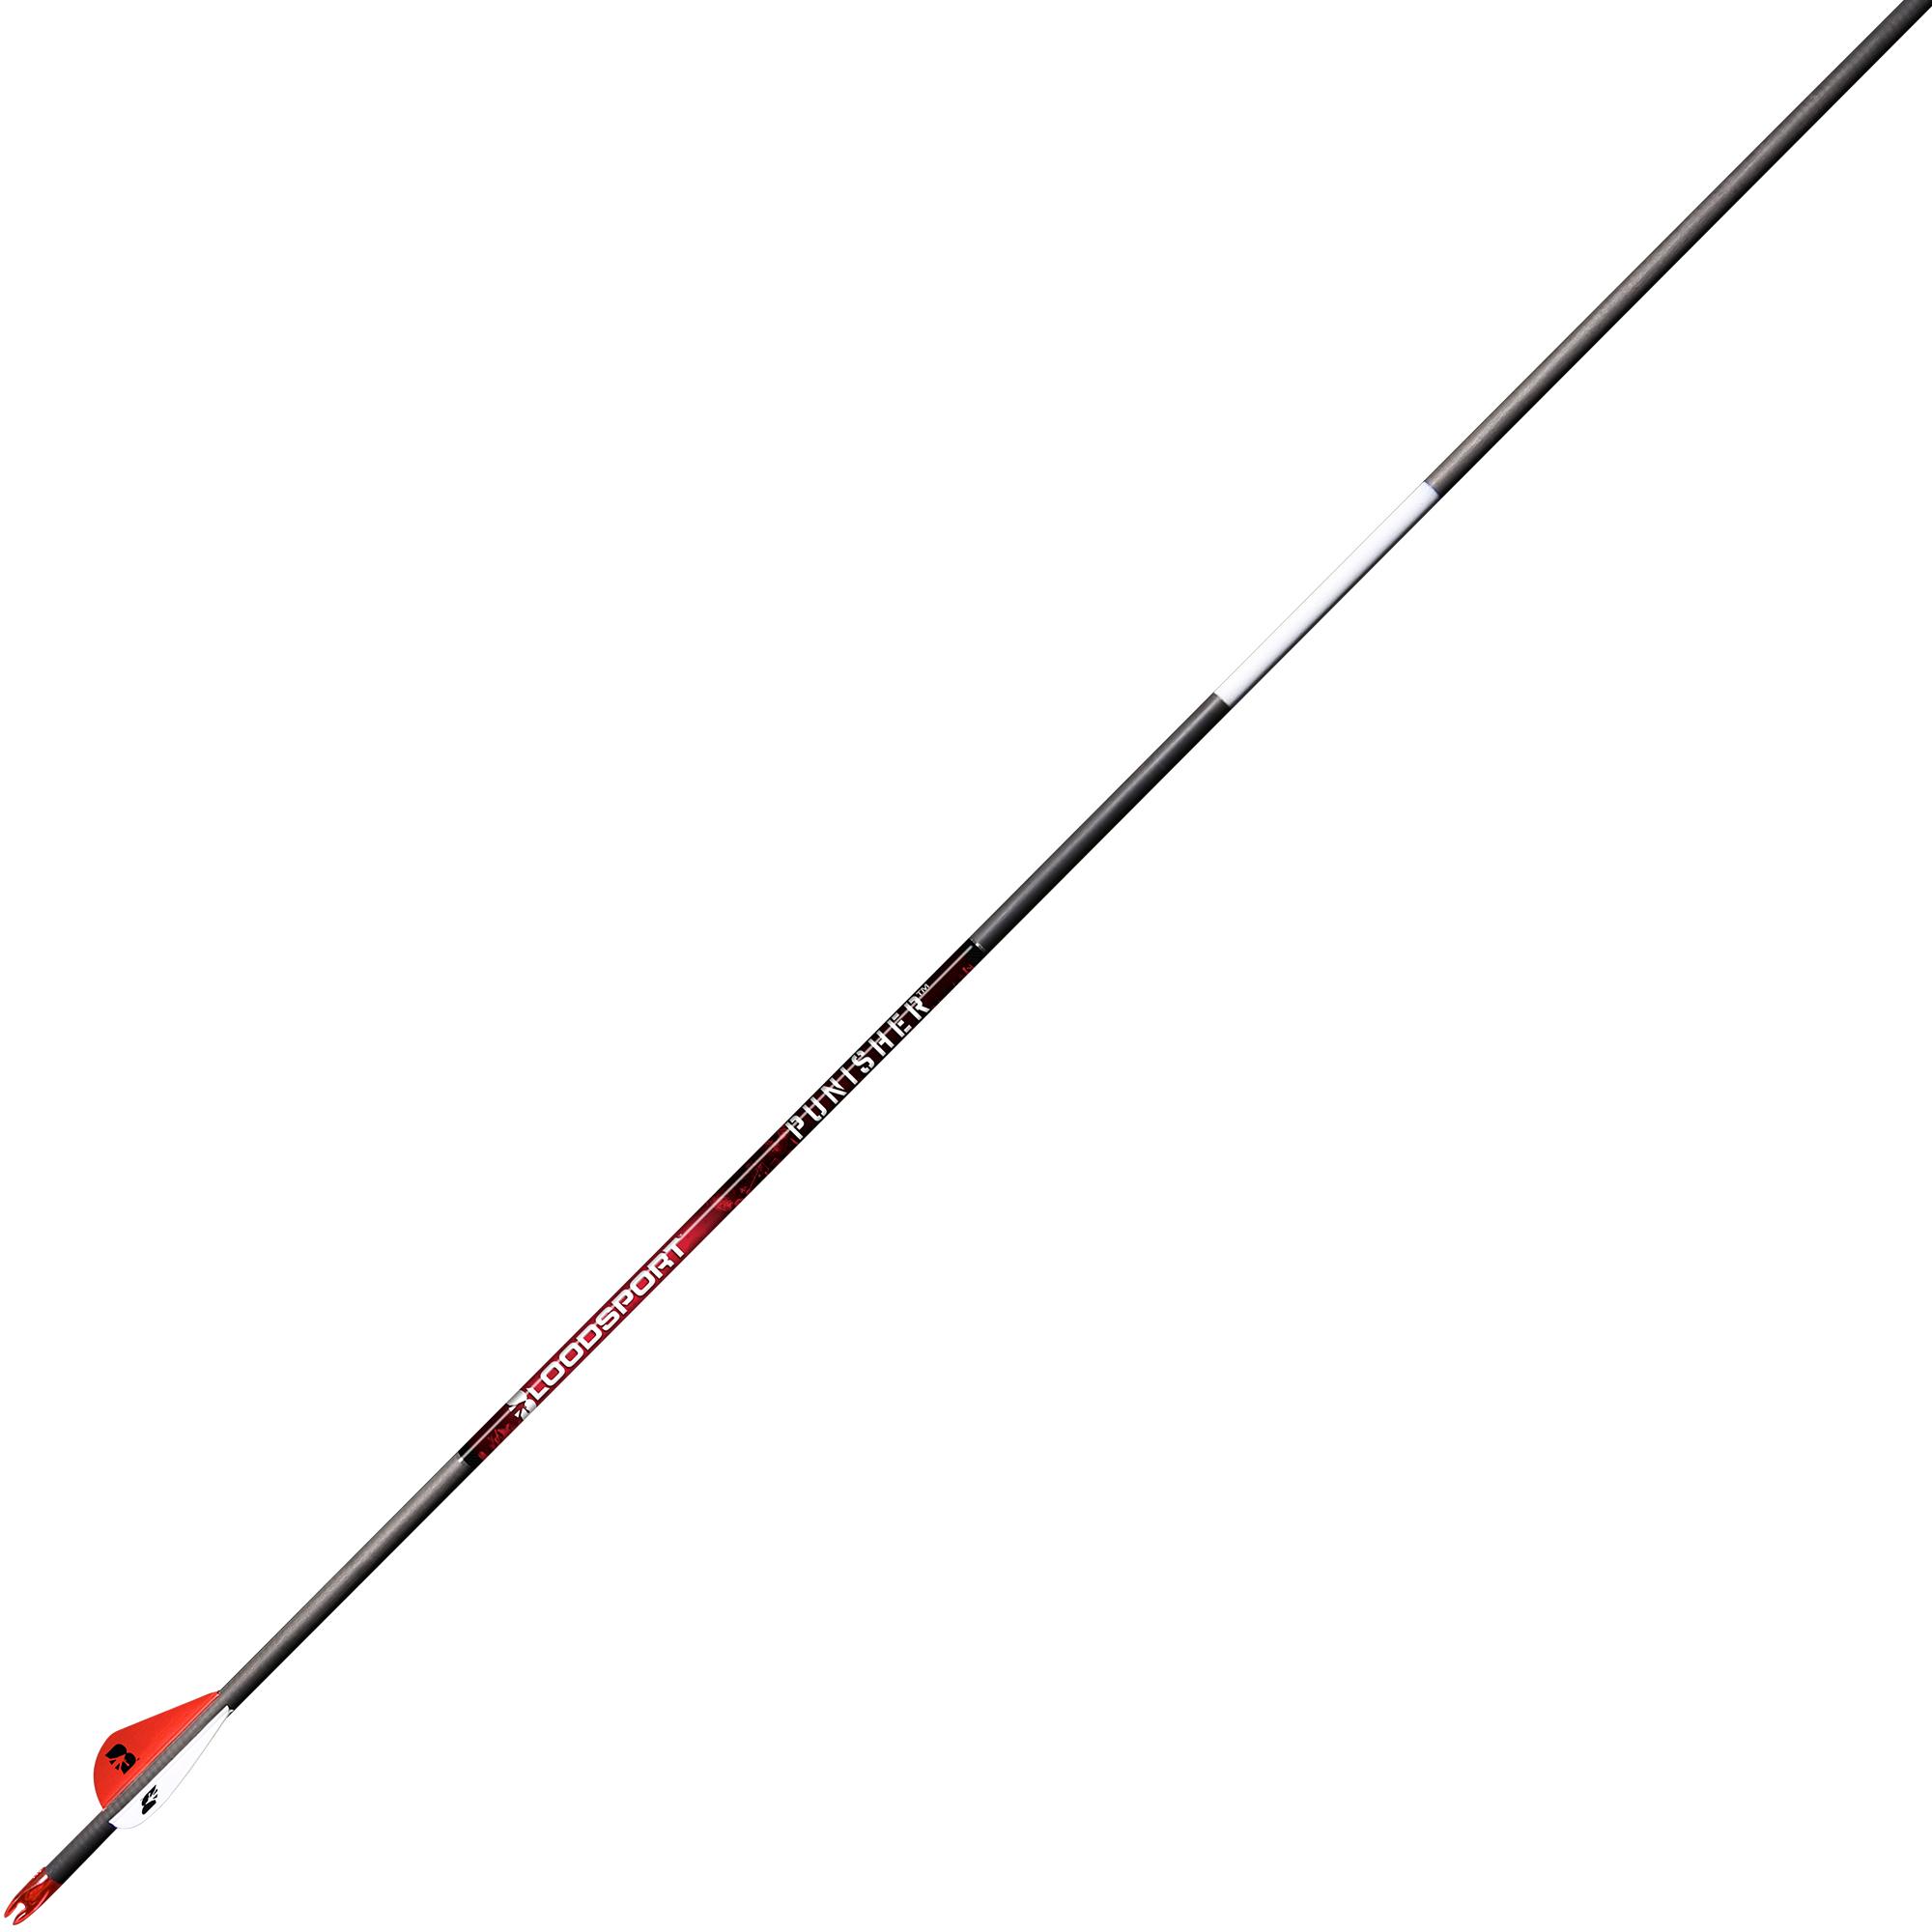 BloodSport Punisher Carbon Arrows, 6-Pack, 350